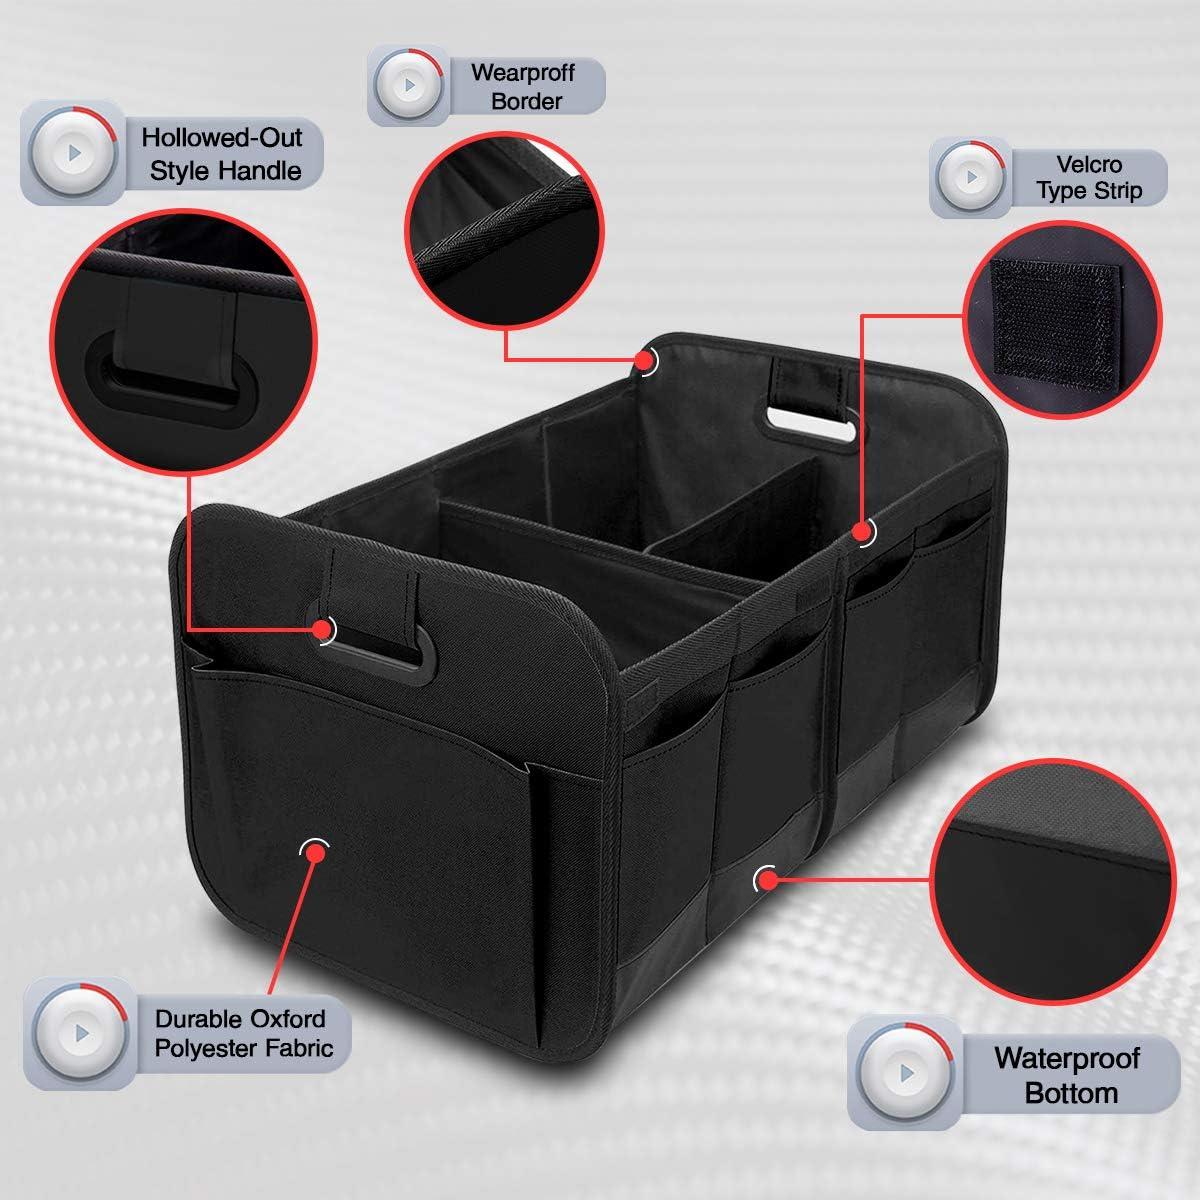 Auto Durable Collapsible Cargo Storage Non Slip Bottom Strips to Prevent Sliding Black Car Trunk Organizer for SUV Truck